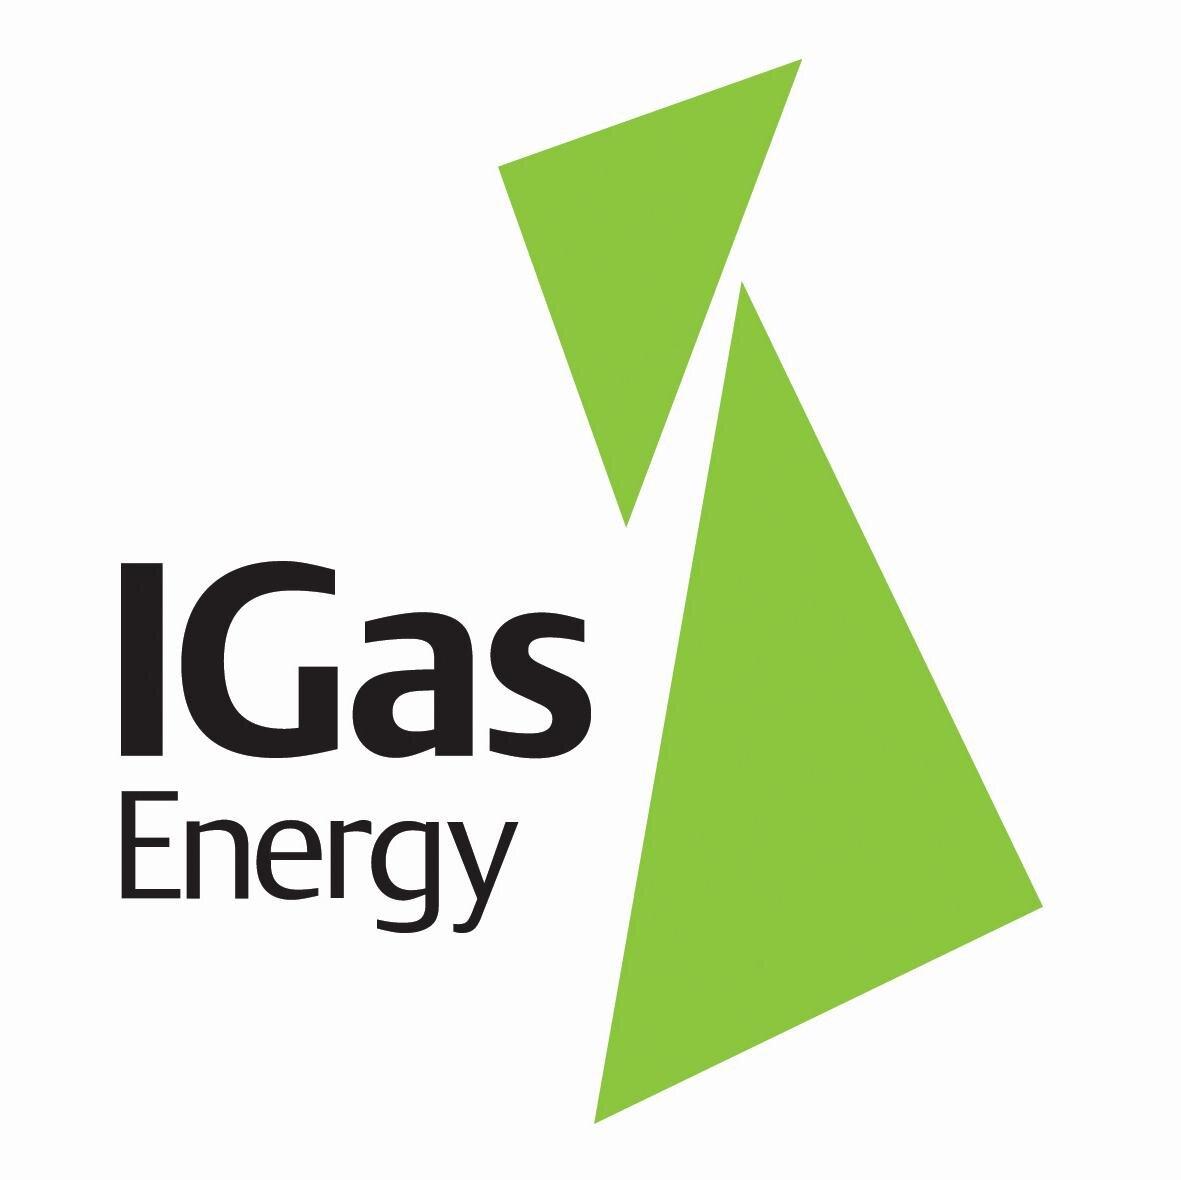 IGas Energy Plc